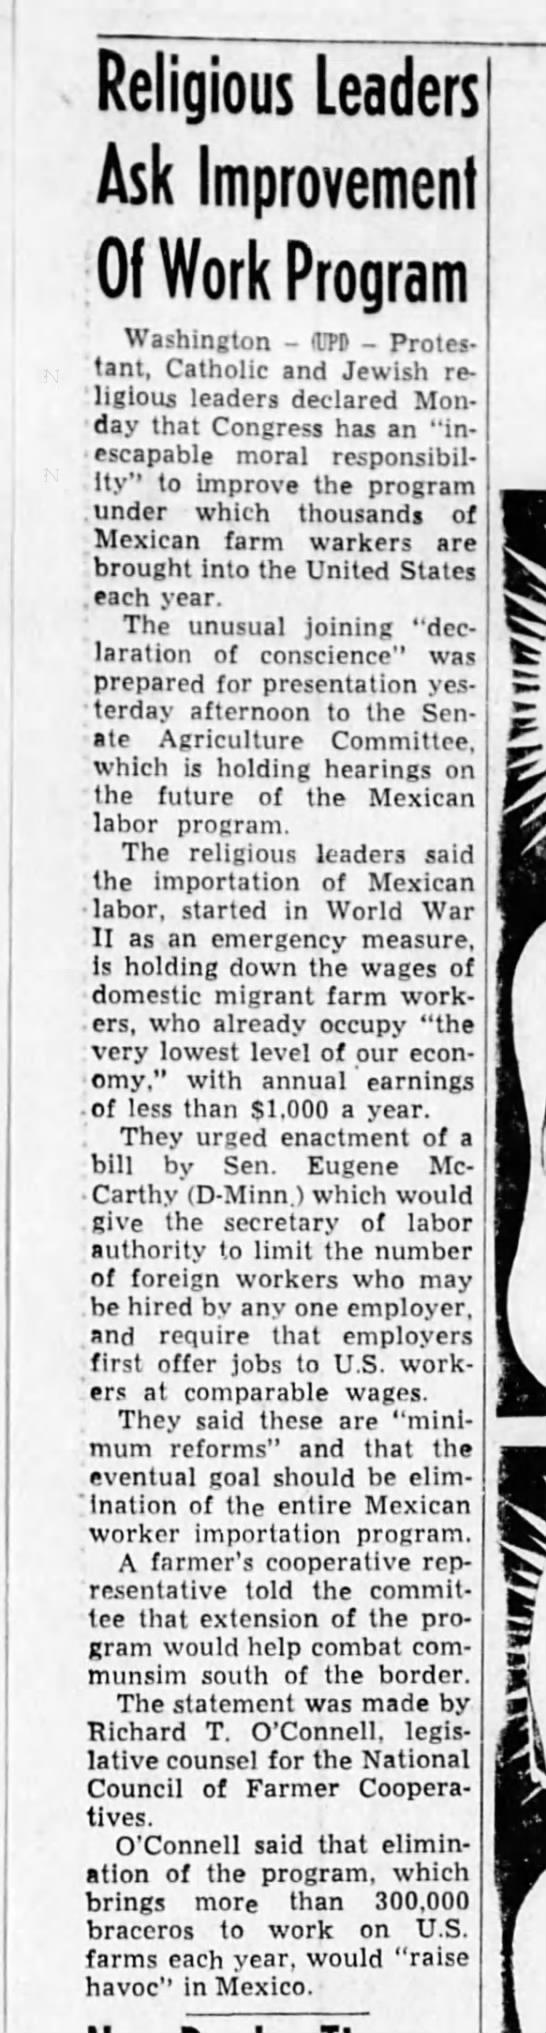 MMT 14 Jun 61 pg 16 - Religious Leaders Ask Improvement Of Work...